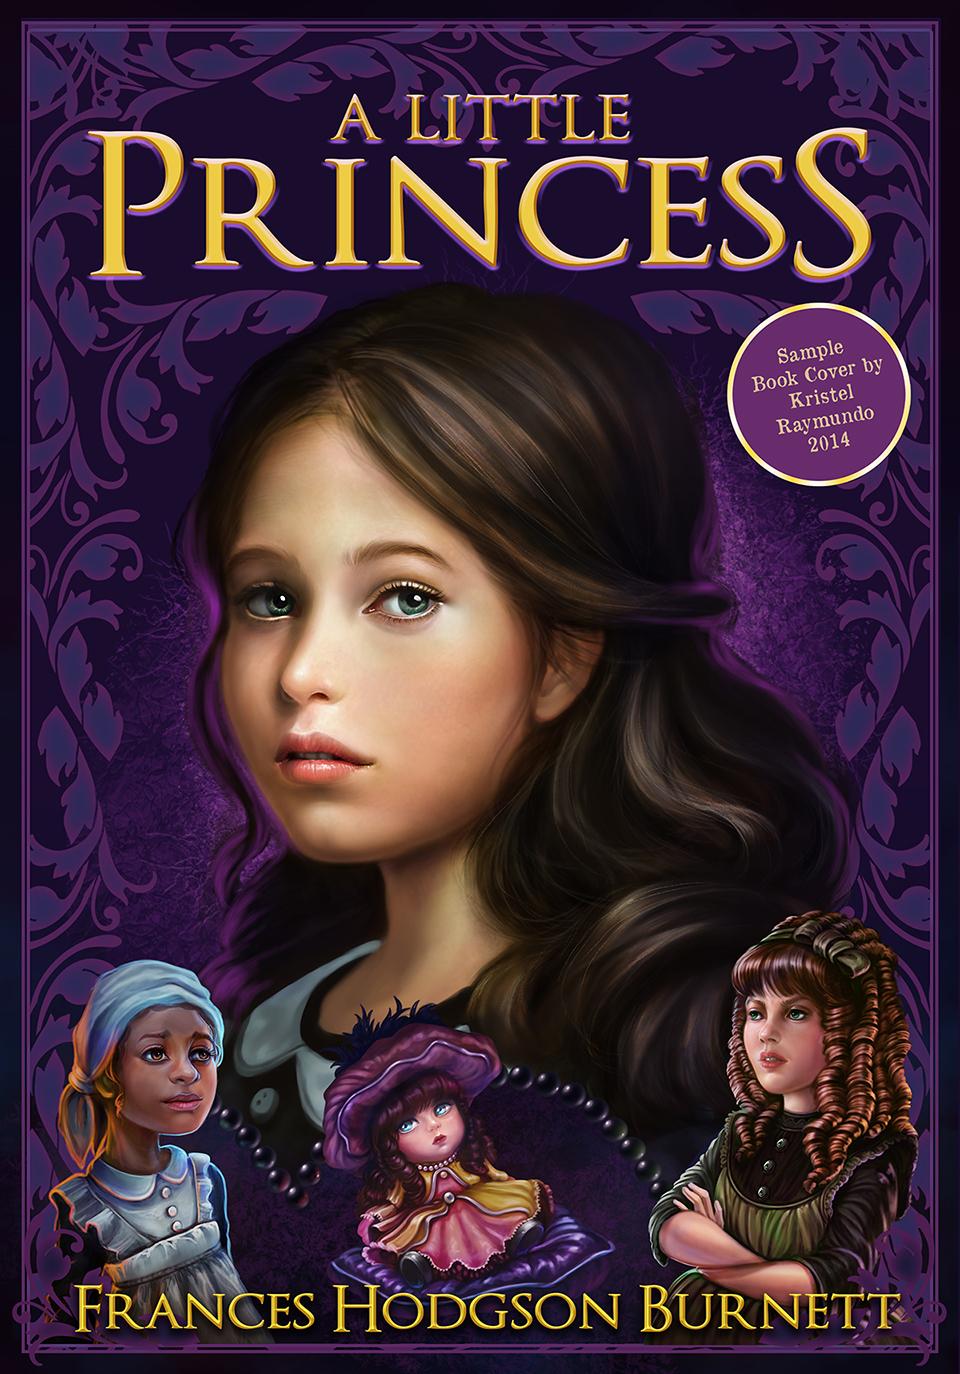 Princess sarah sample book cover illustration by krayisako on deviantart - Princesse sarah 17 ...